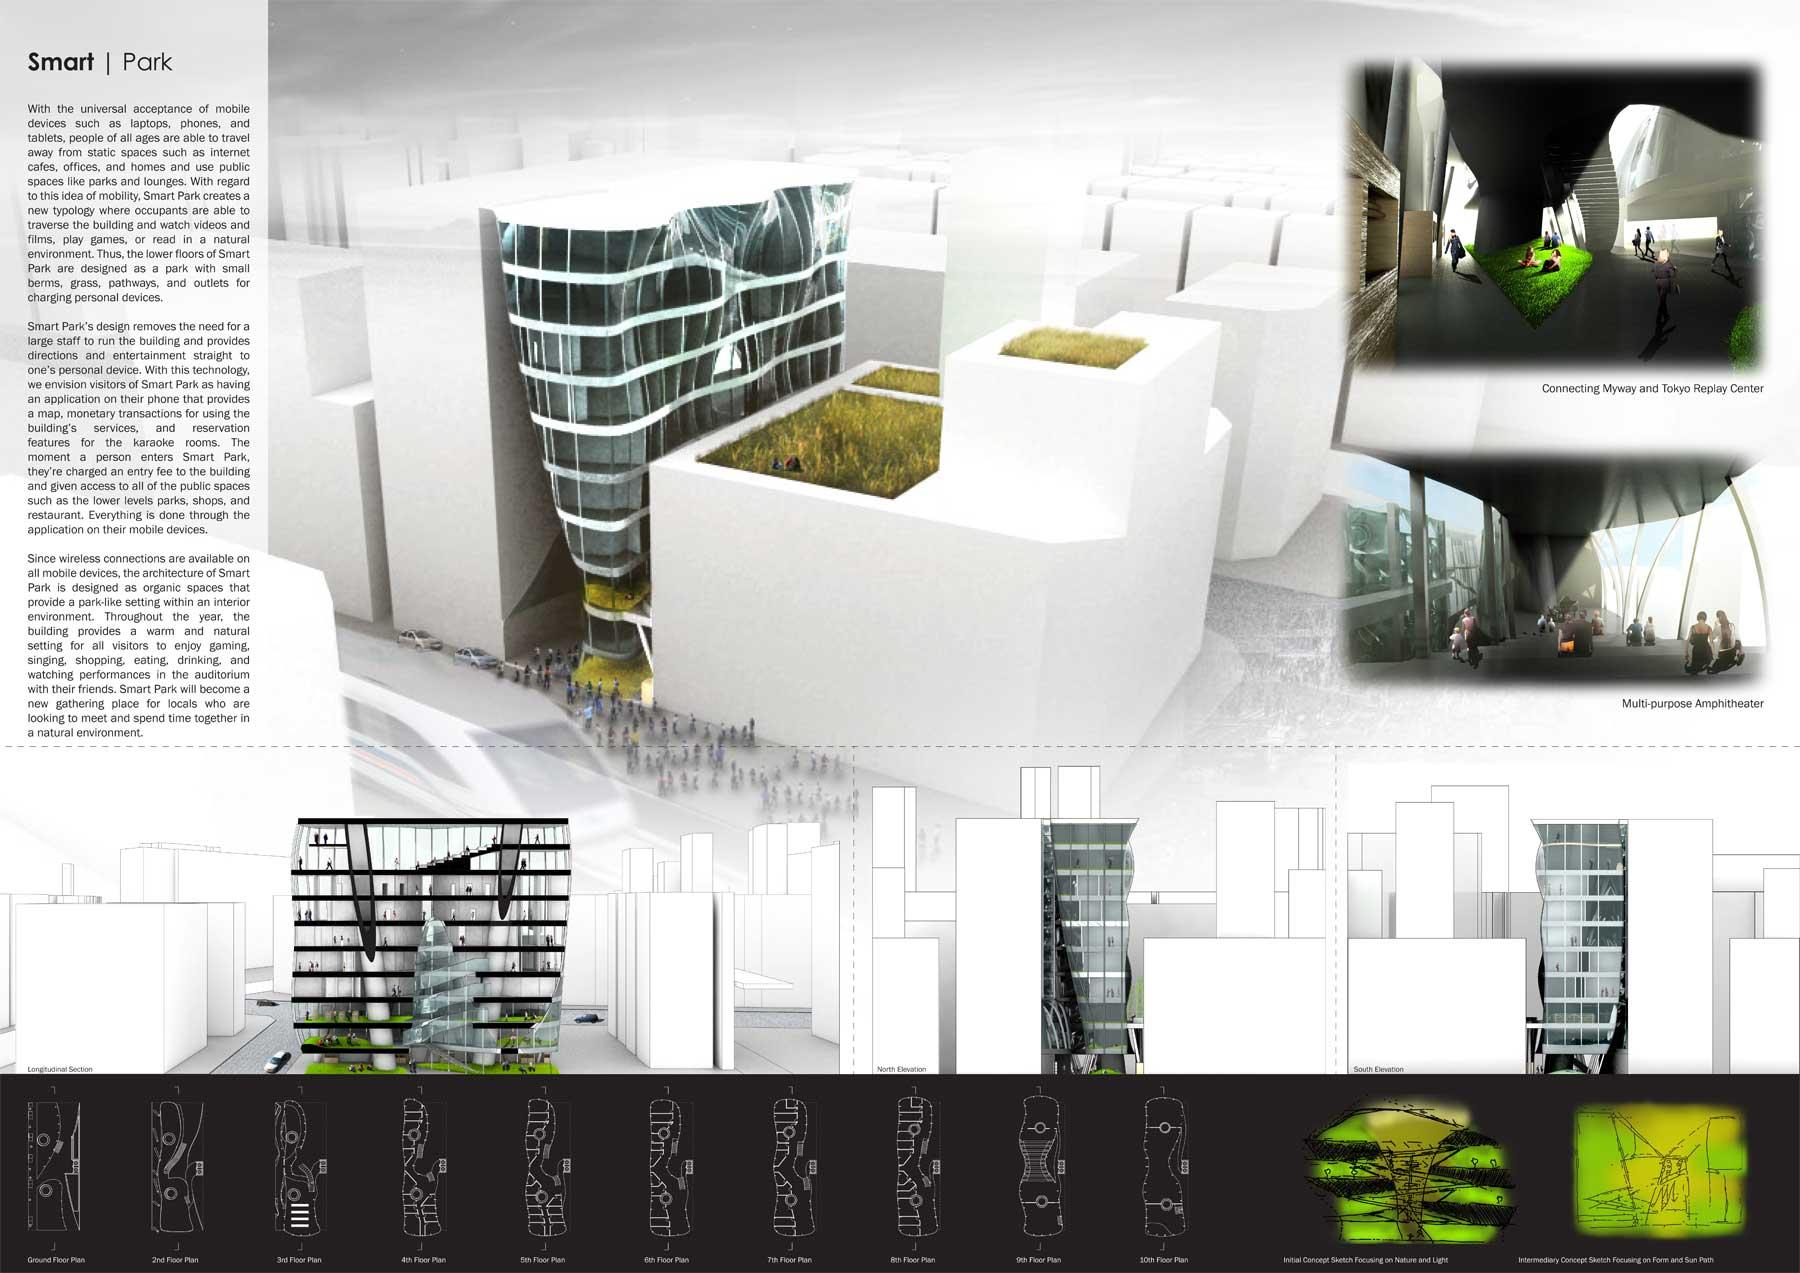 Smart Park Design Board